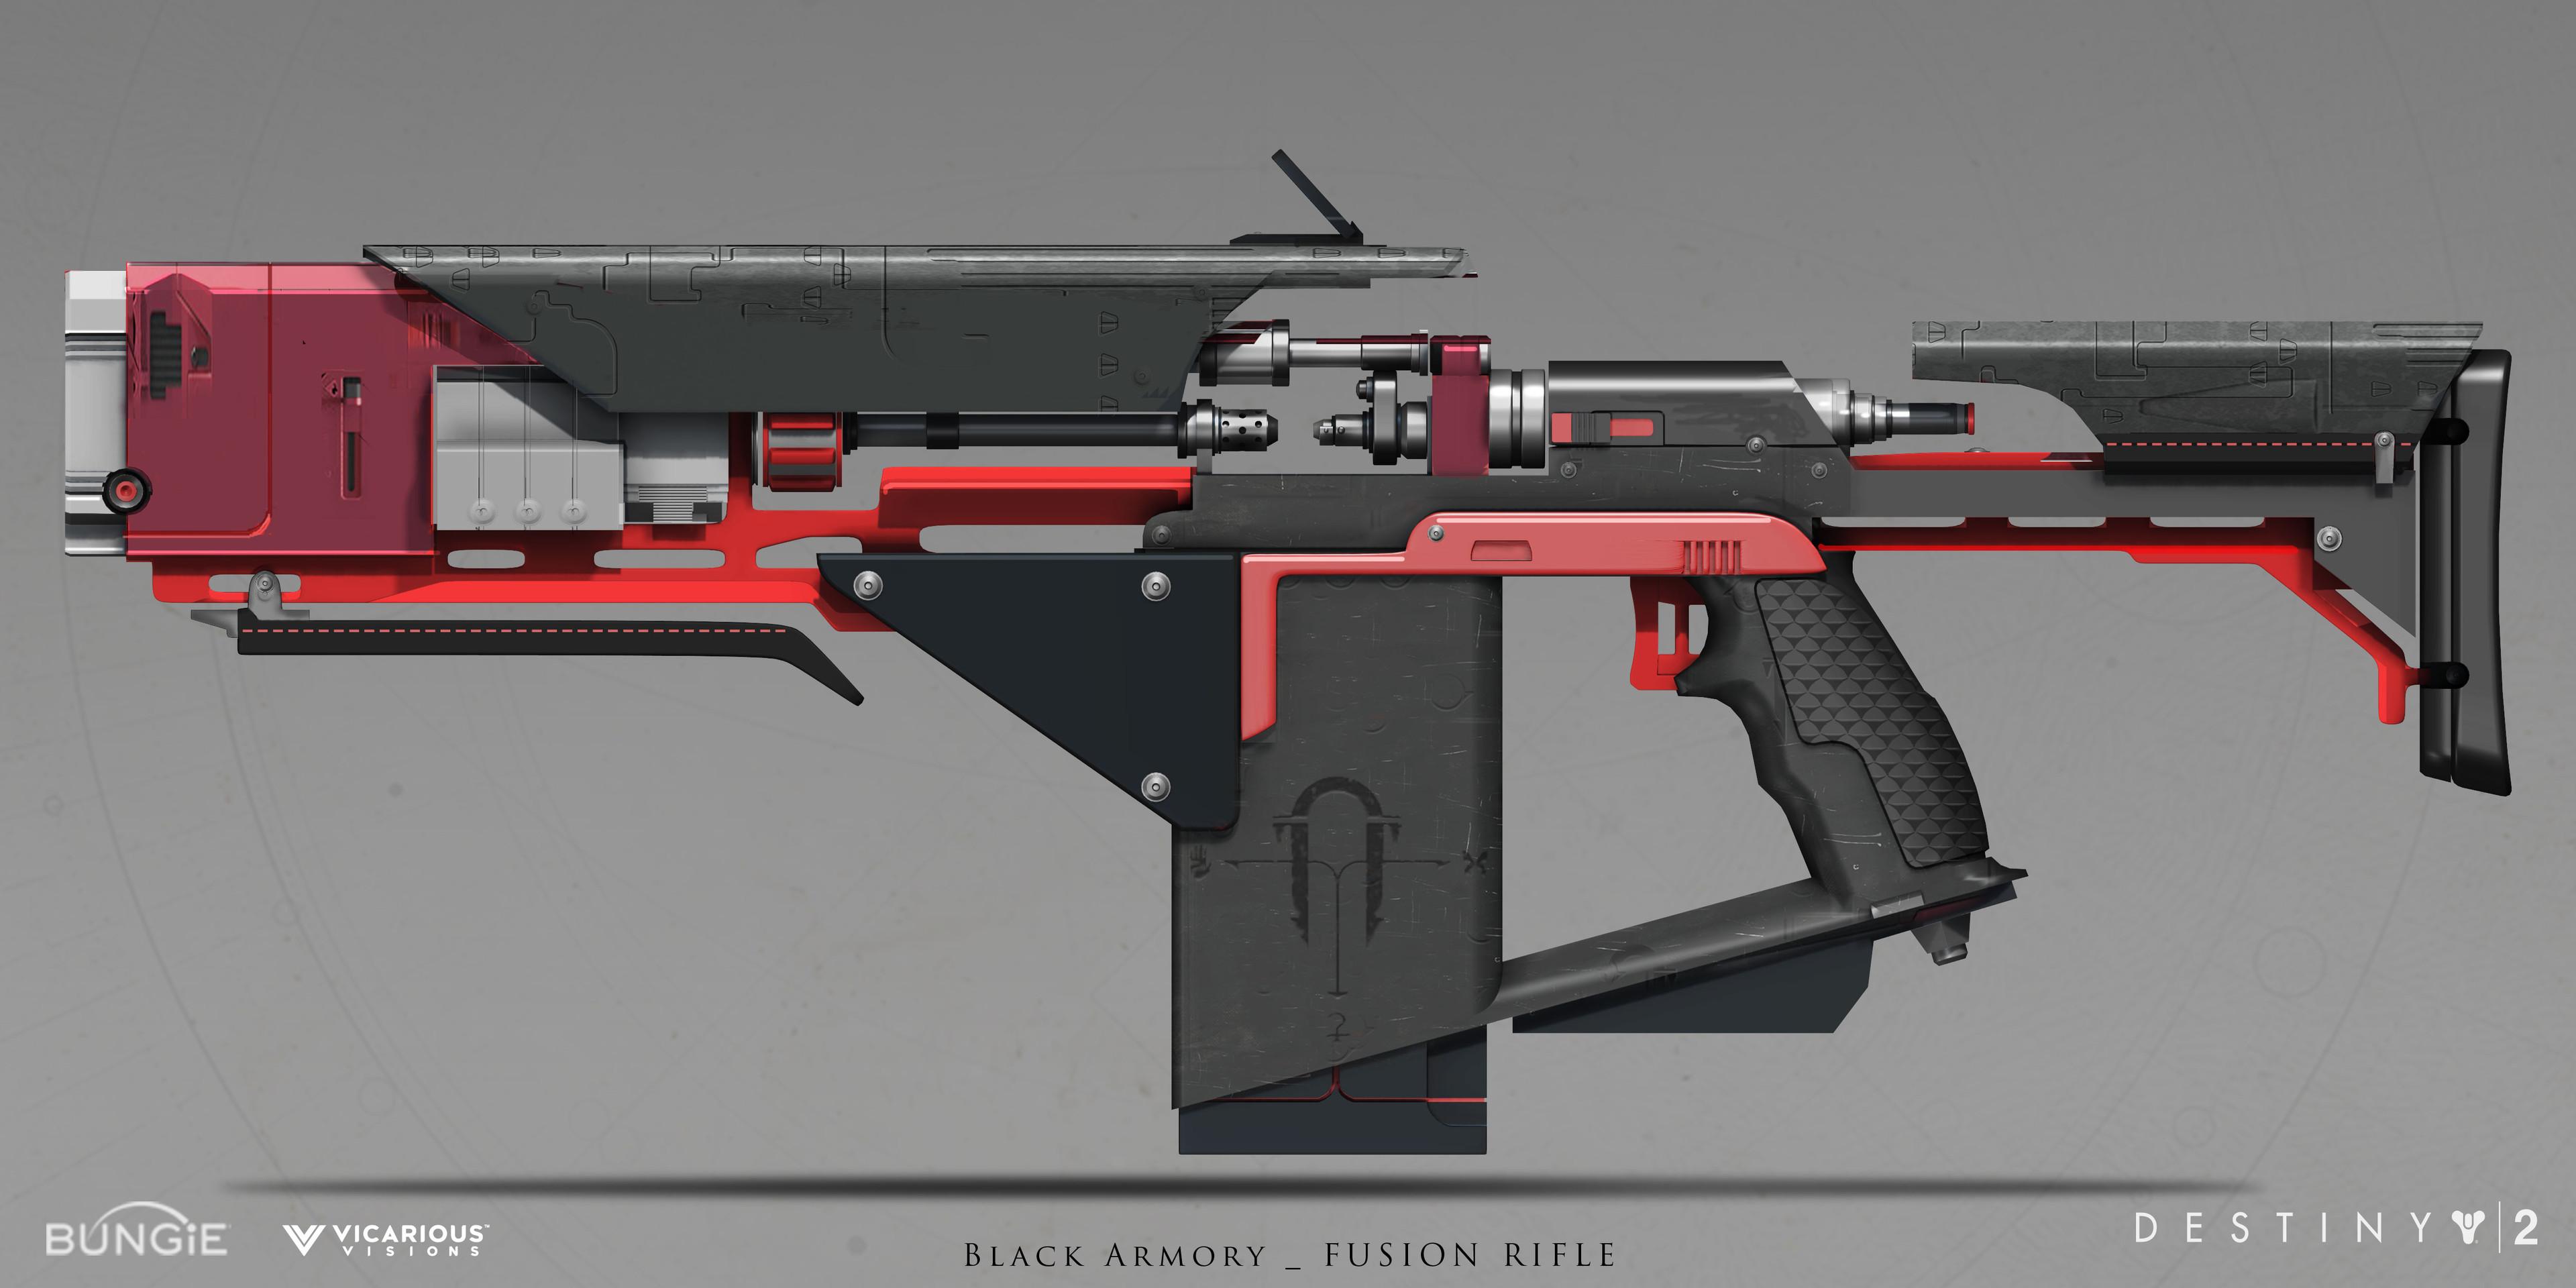 Tempered Dynamo: Weapon design for Destiny 2 Black Armory DLC